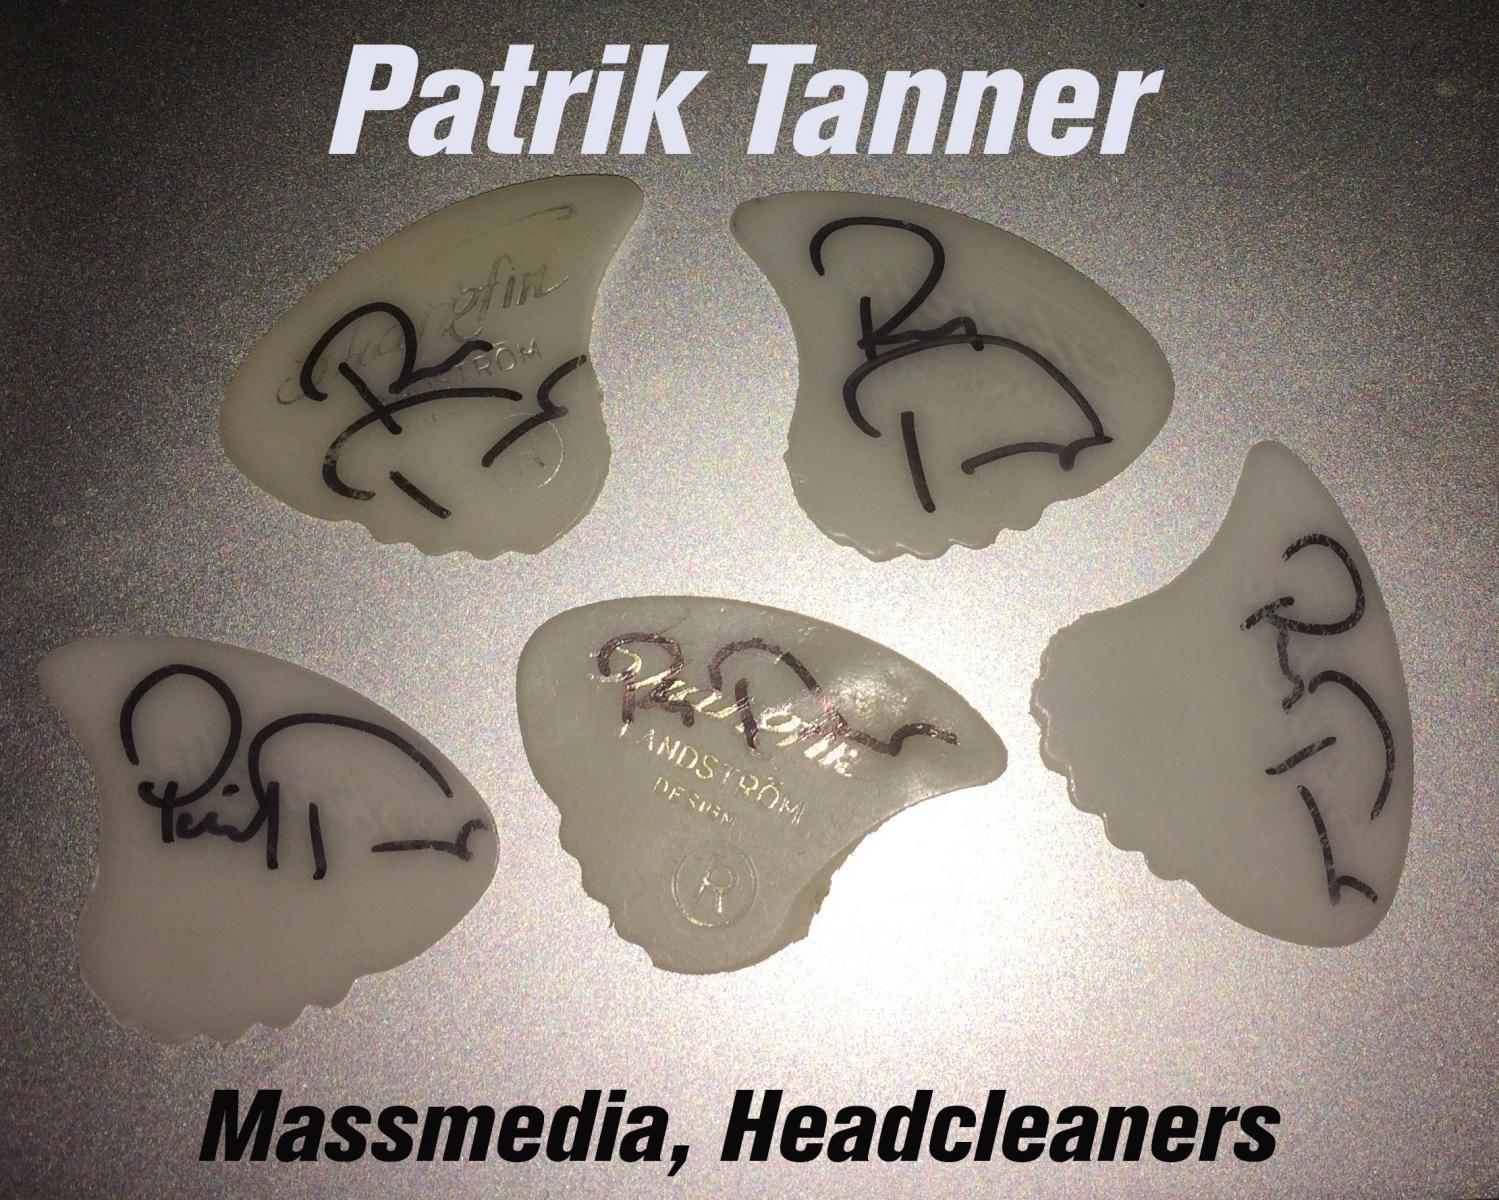 Patrik Tanner